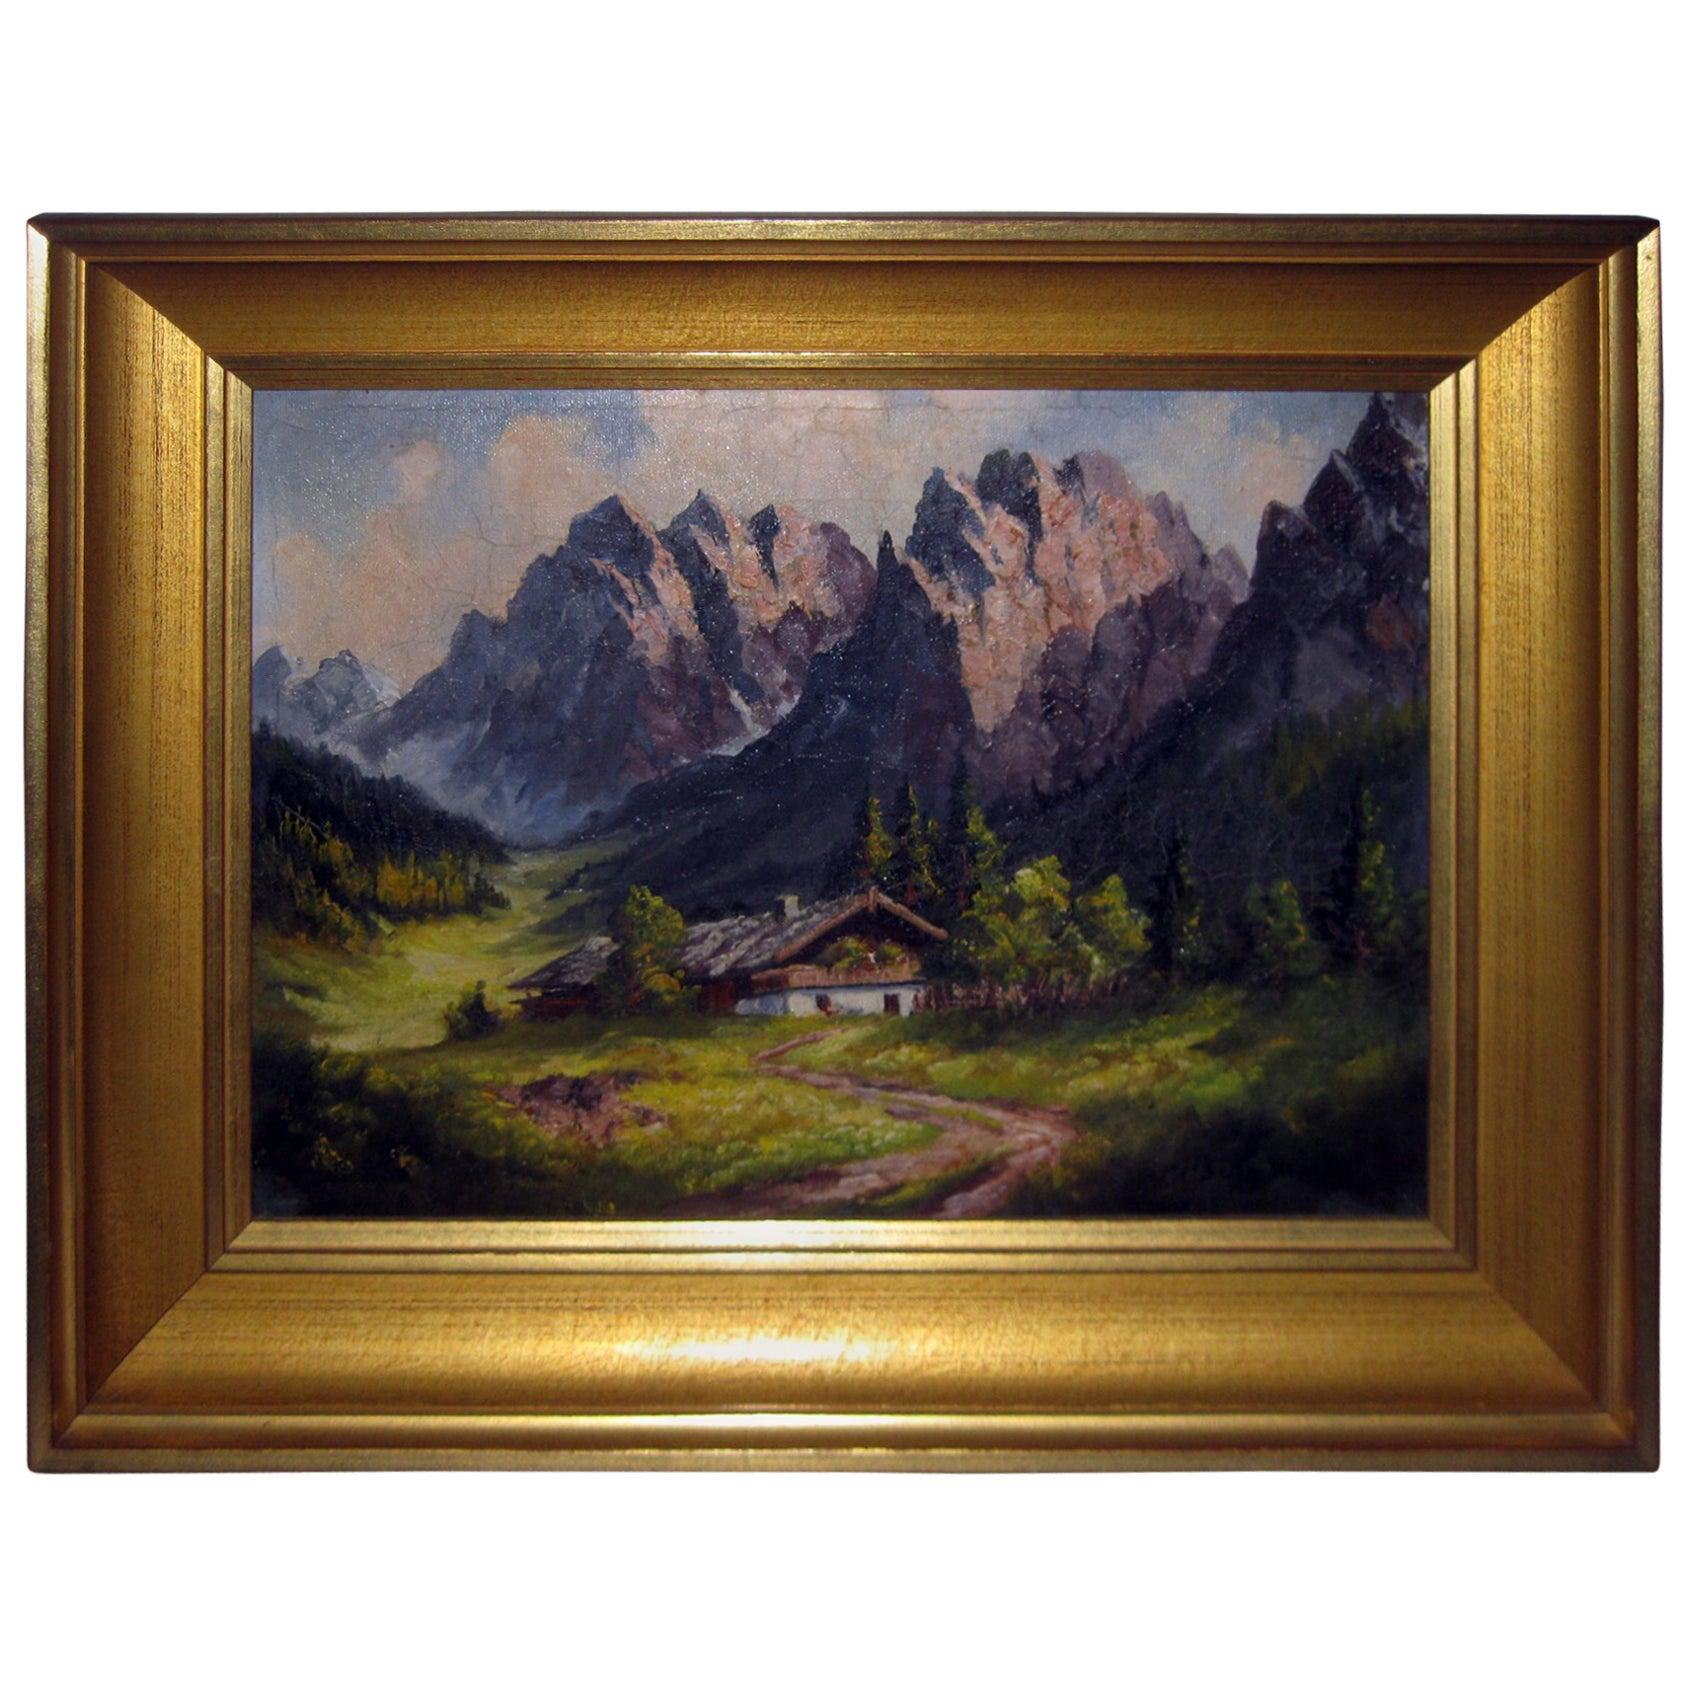 19th century Oil Painting Seealpsee, Switzerland